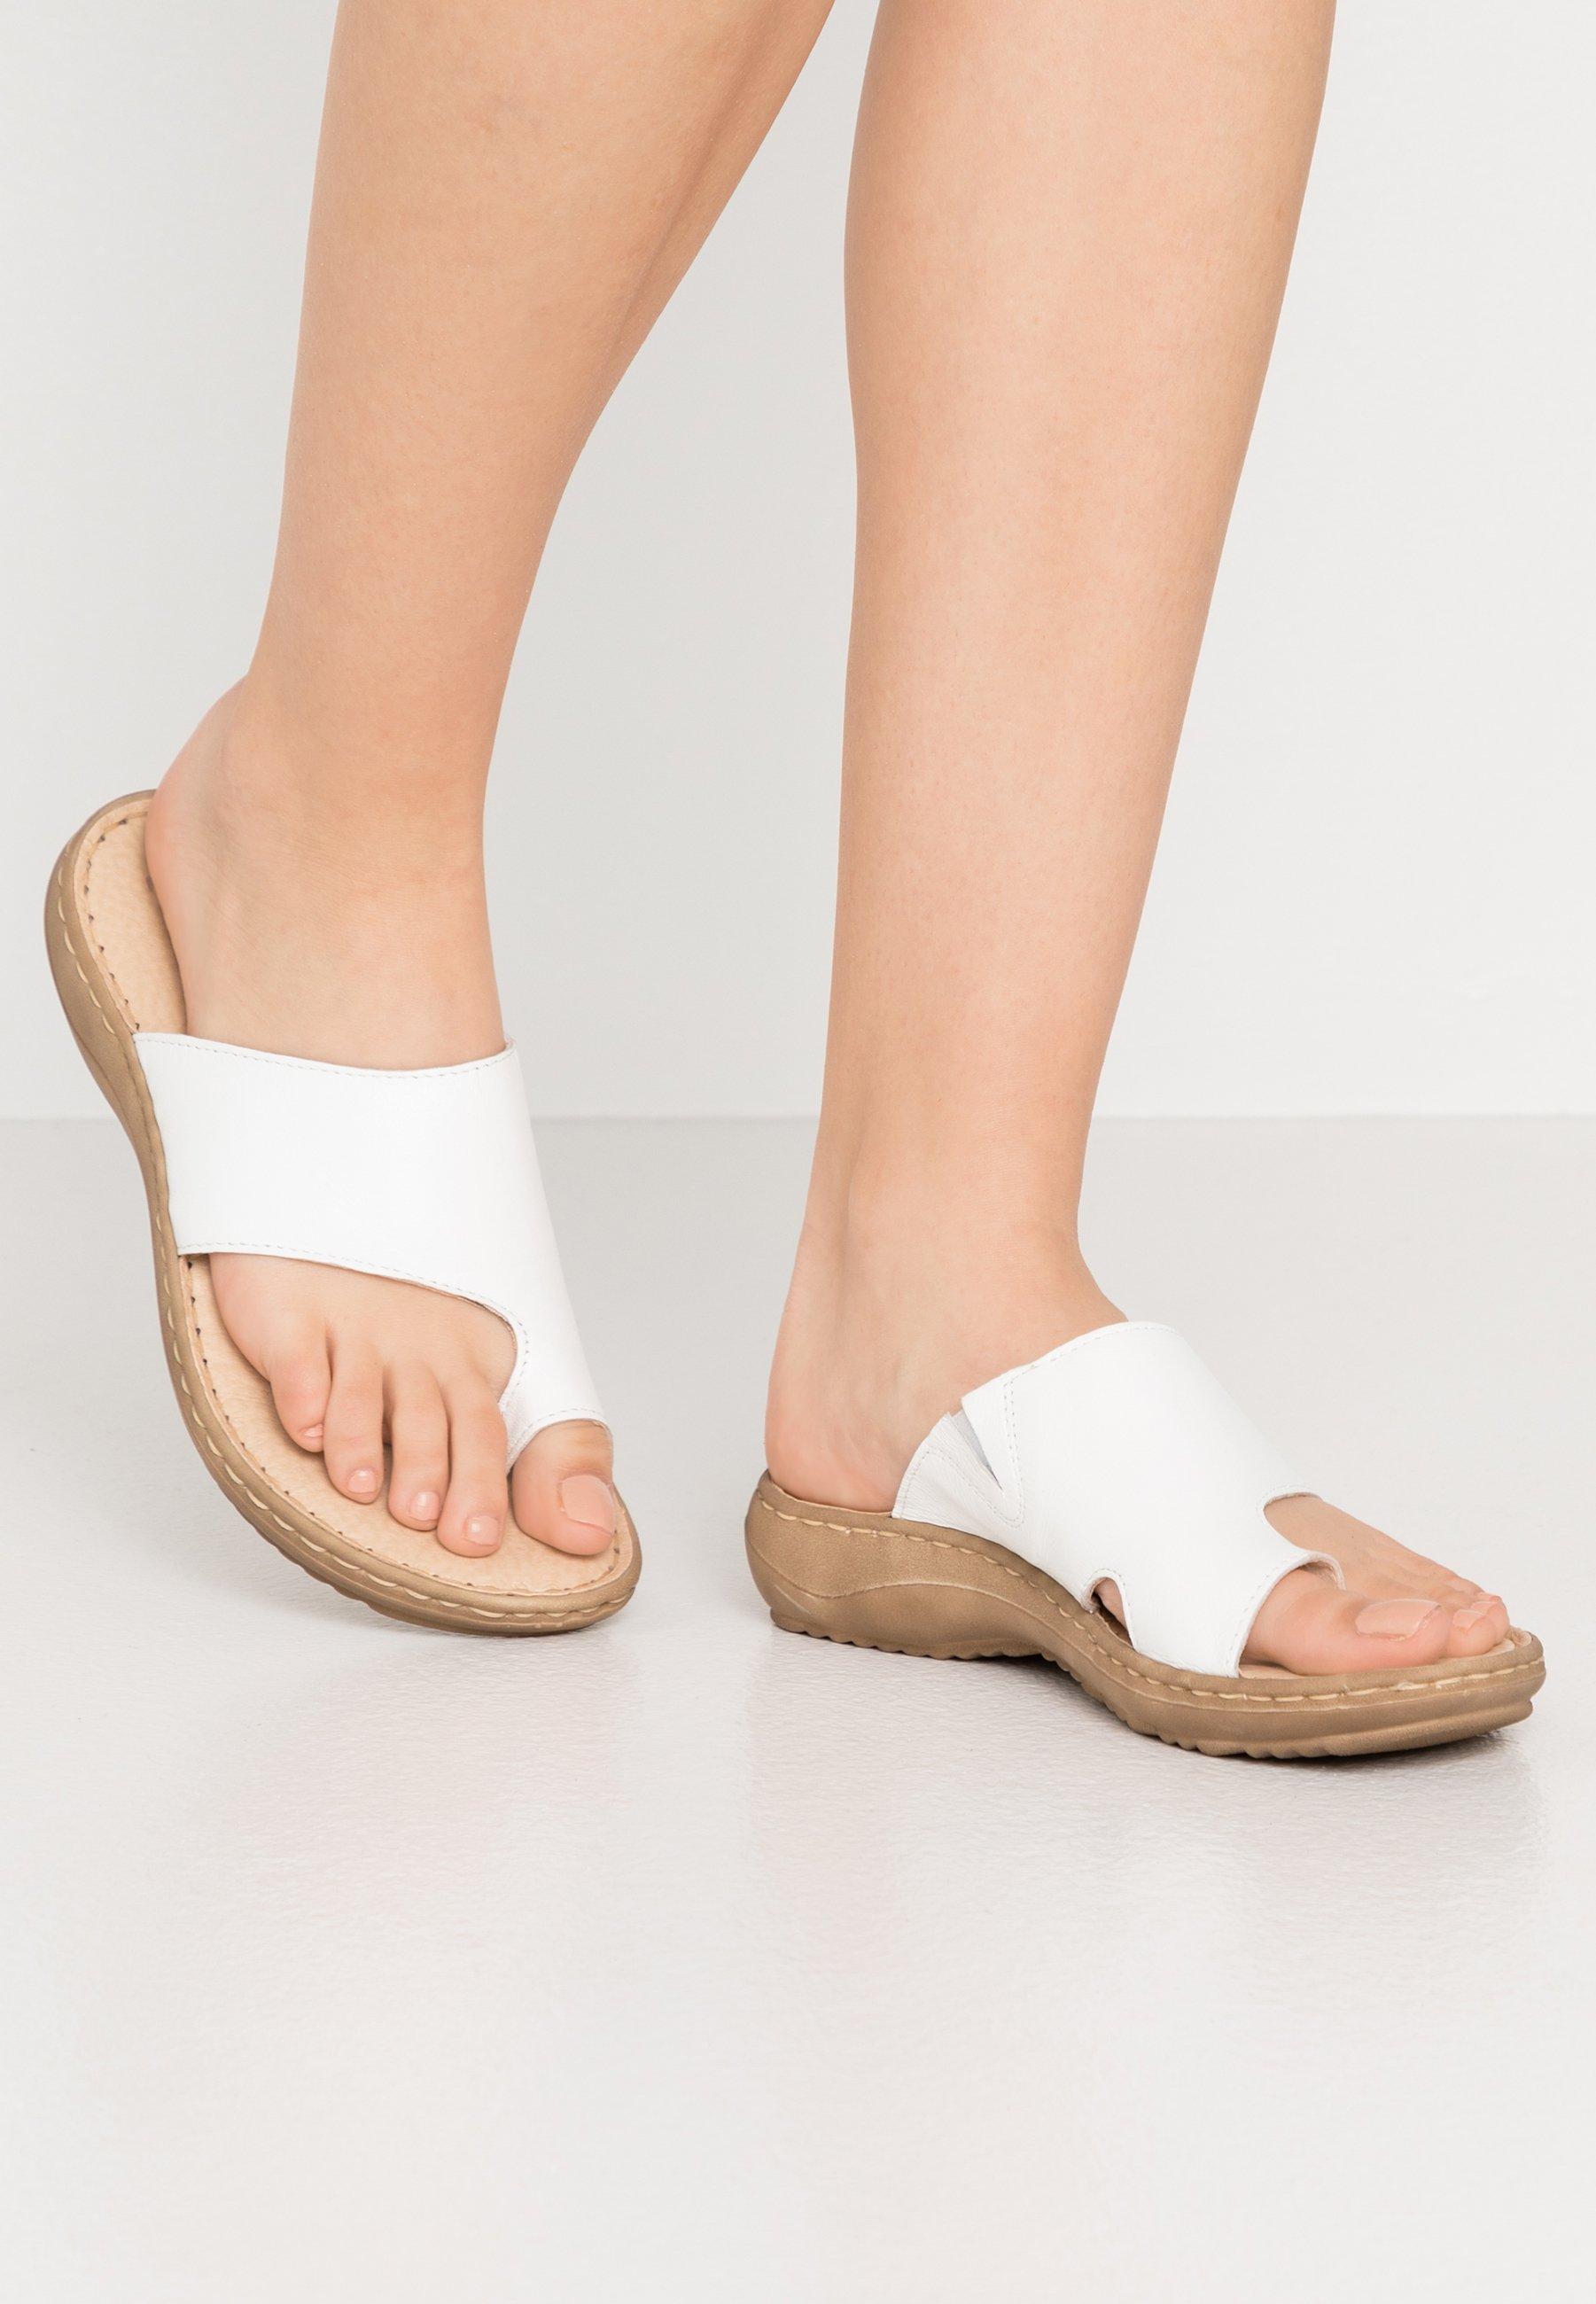 Marco Tozzi SLIDES - Tongs - white - Sandales & Nu-pieds femme Original